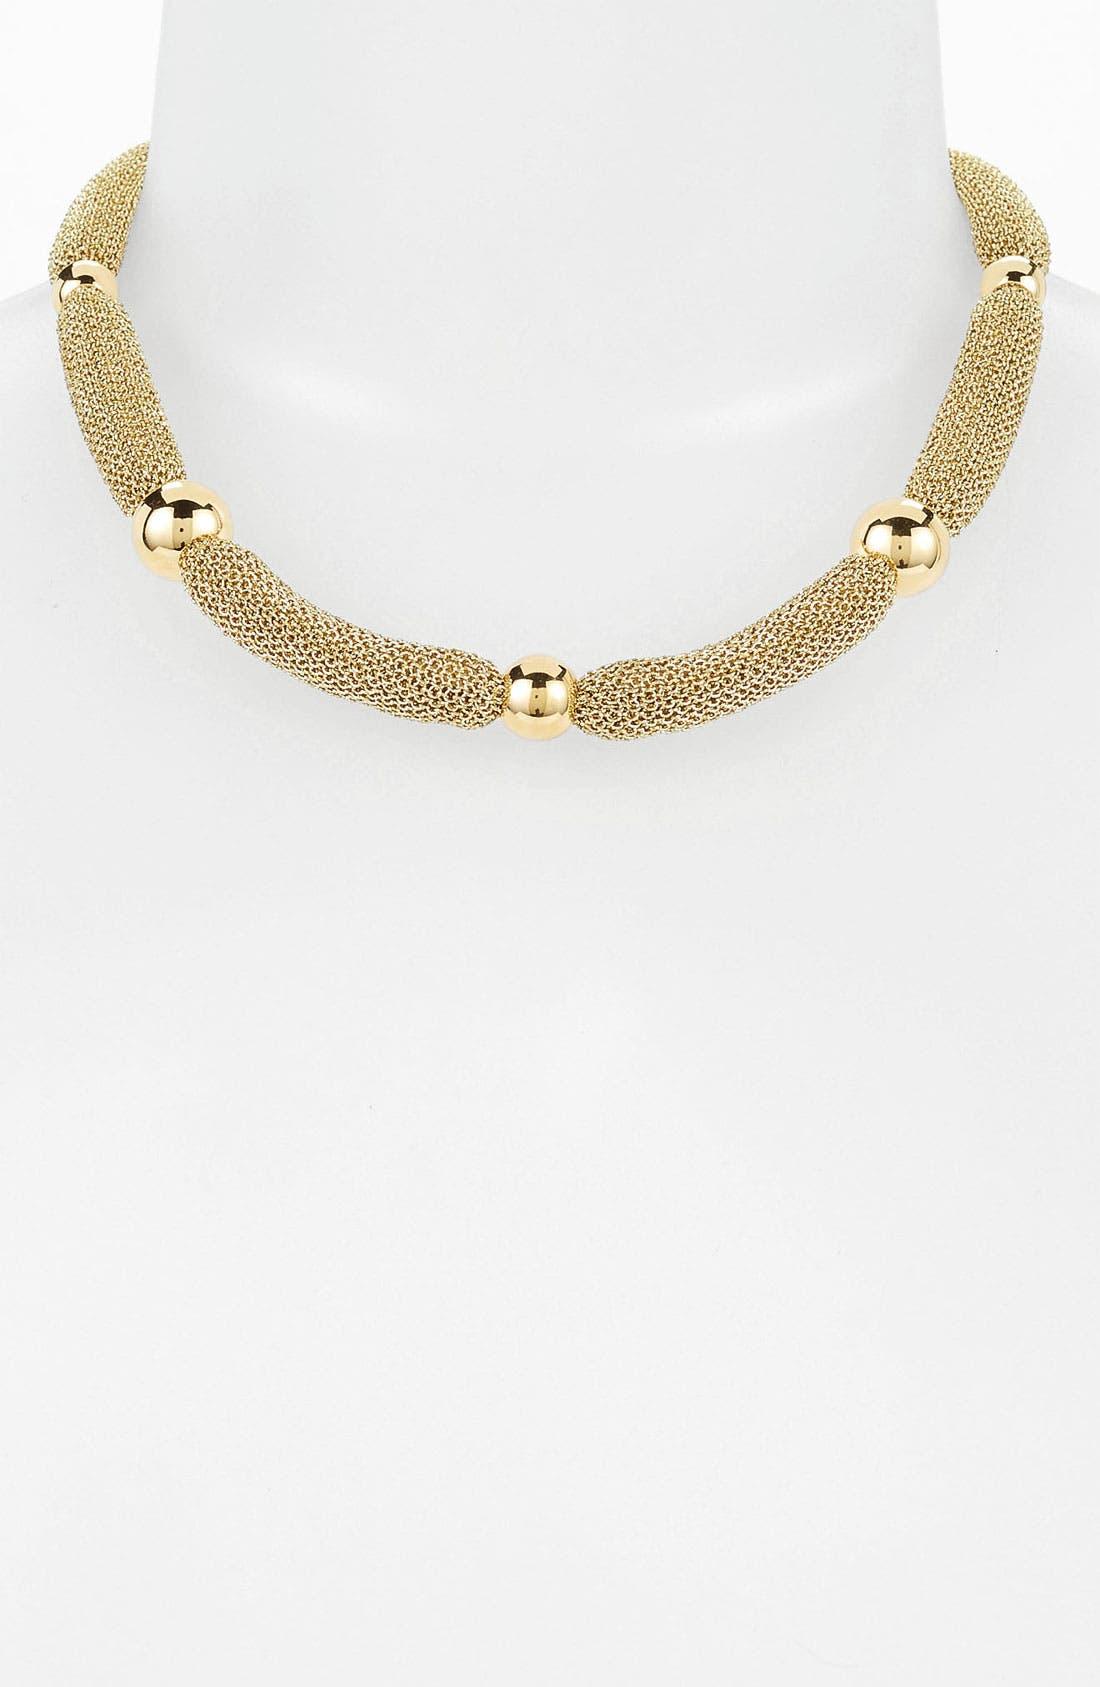 Main Image - Adami & Martucci 'Mesh' Collar Necklace